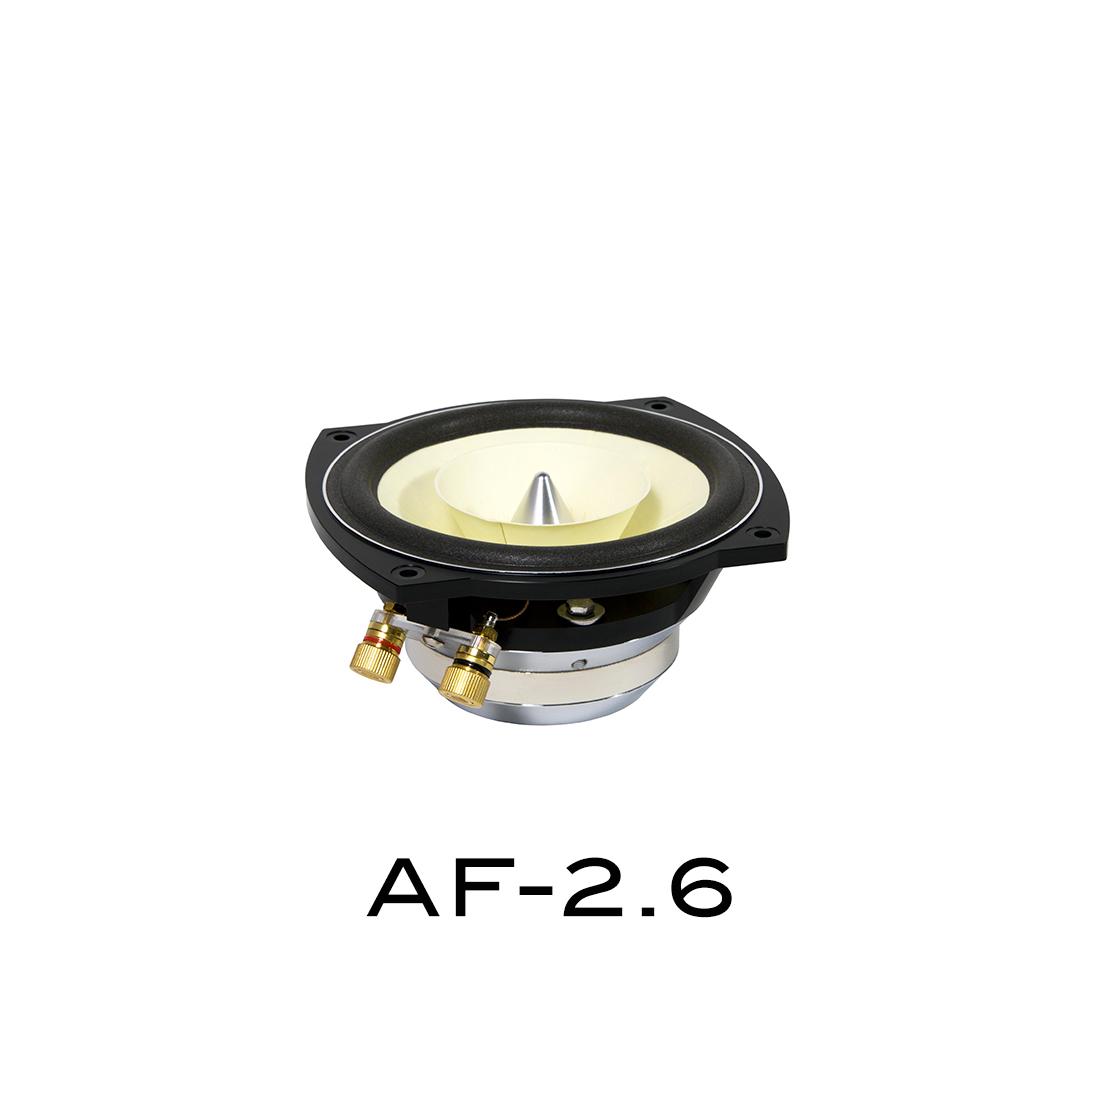 AF-2.6